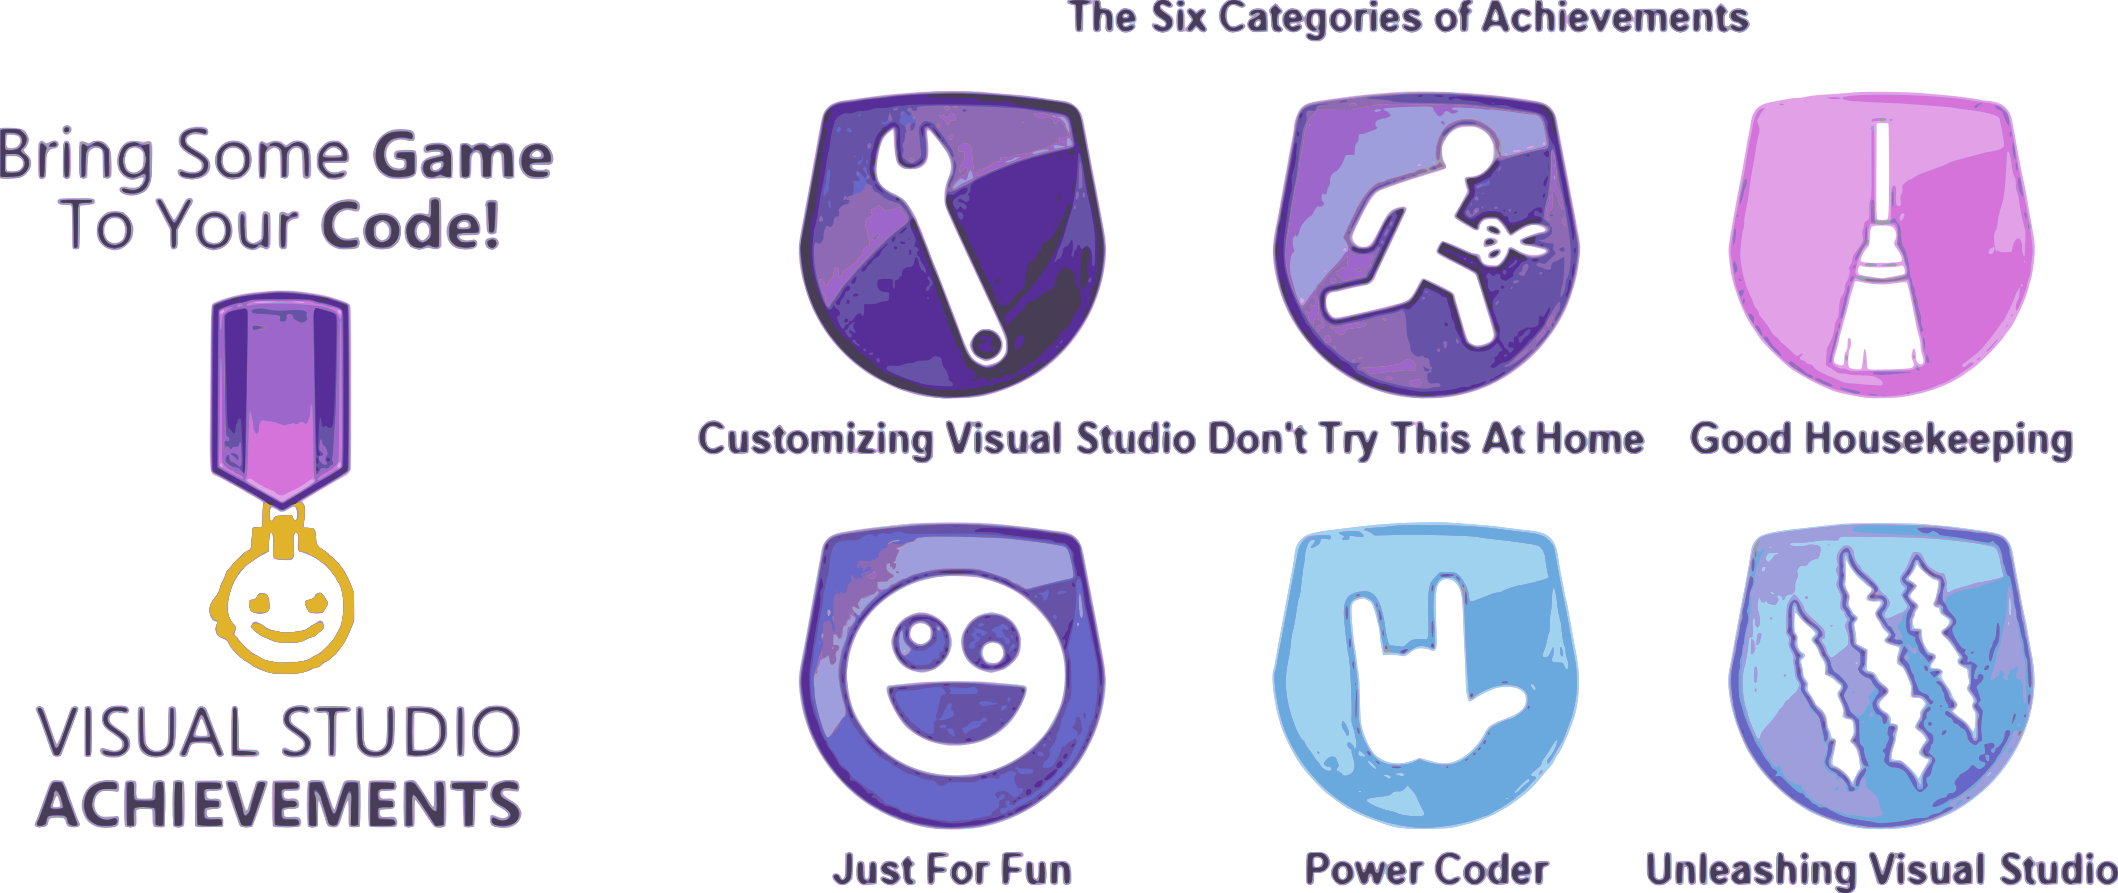 Программа достижений Visual Studio